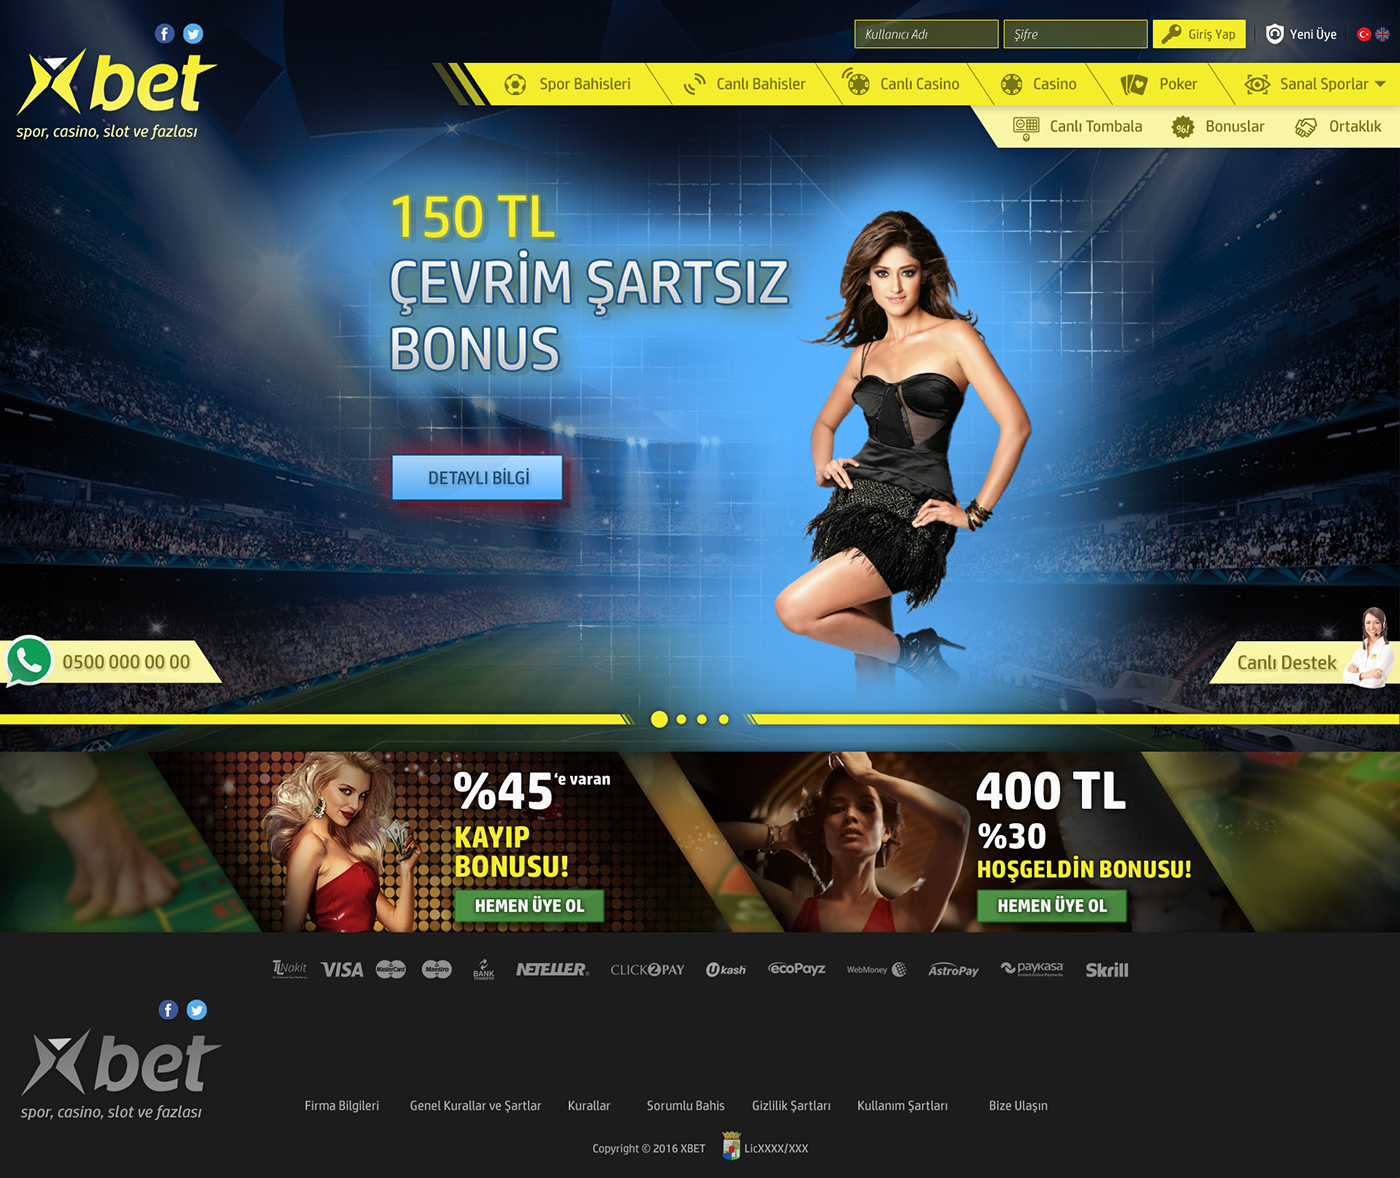 casino bet game user experience Web Design